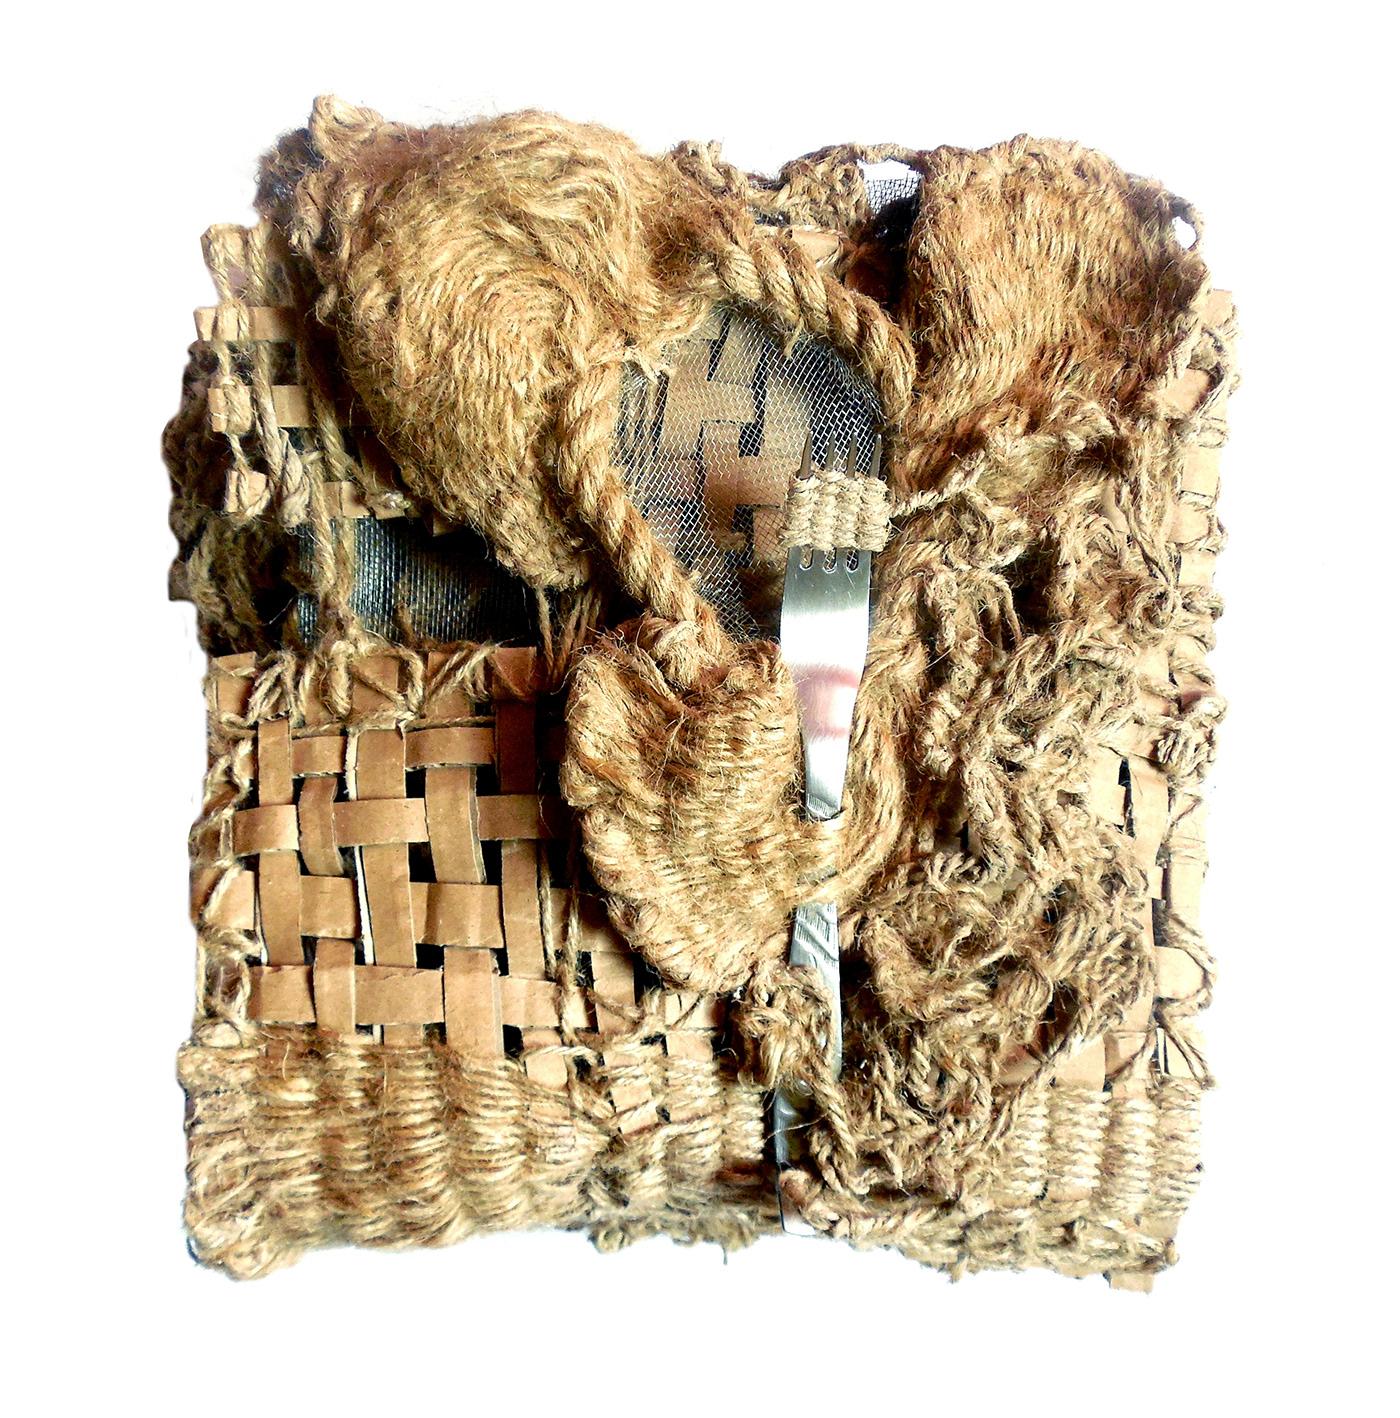 infinity book art book book object textile art fiber art Art Installation rope art Dada to be continued